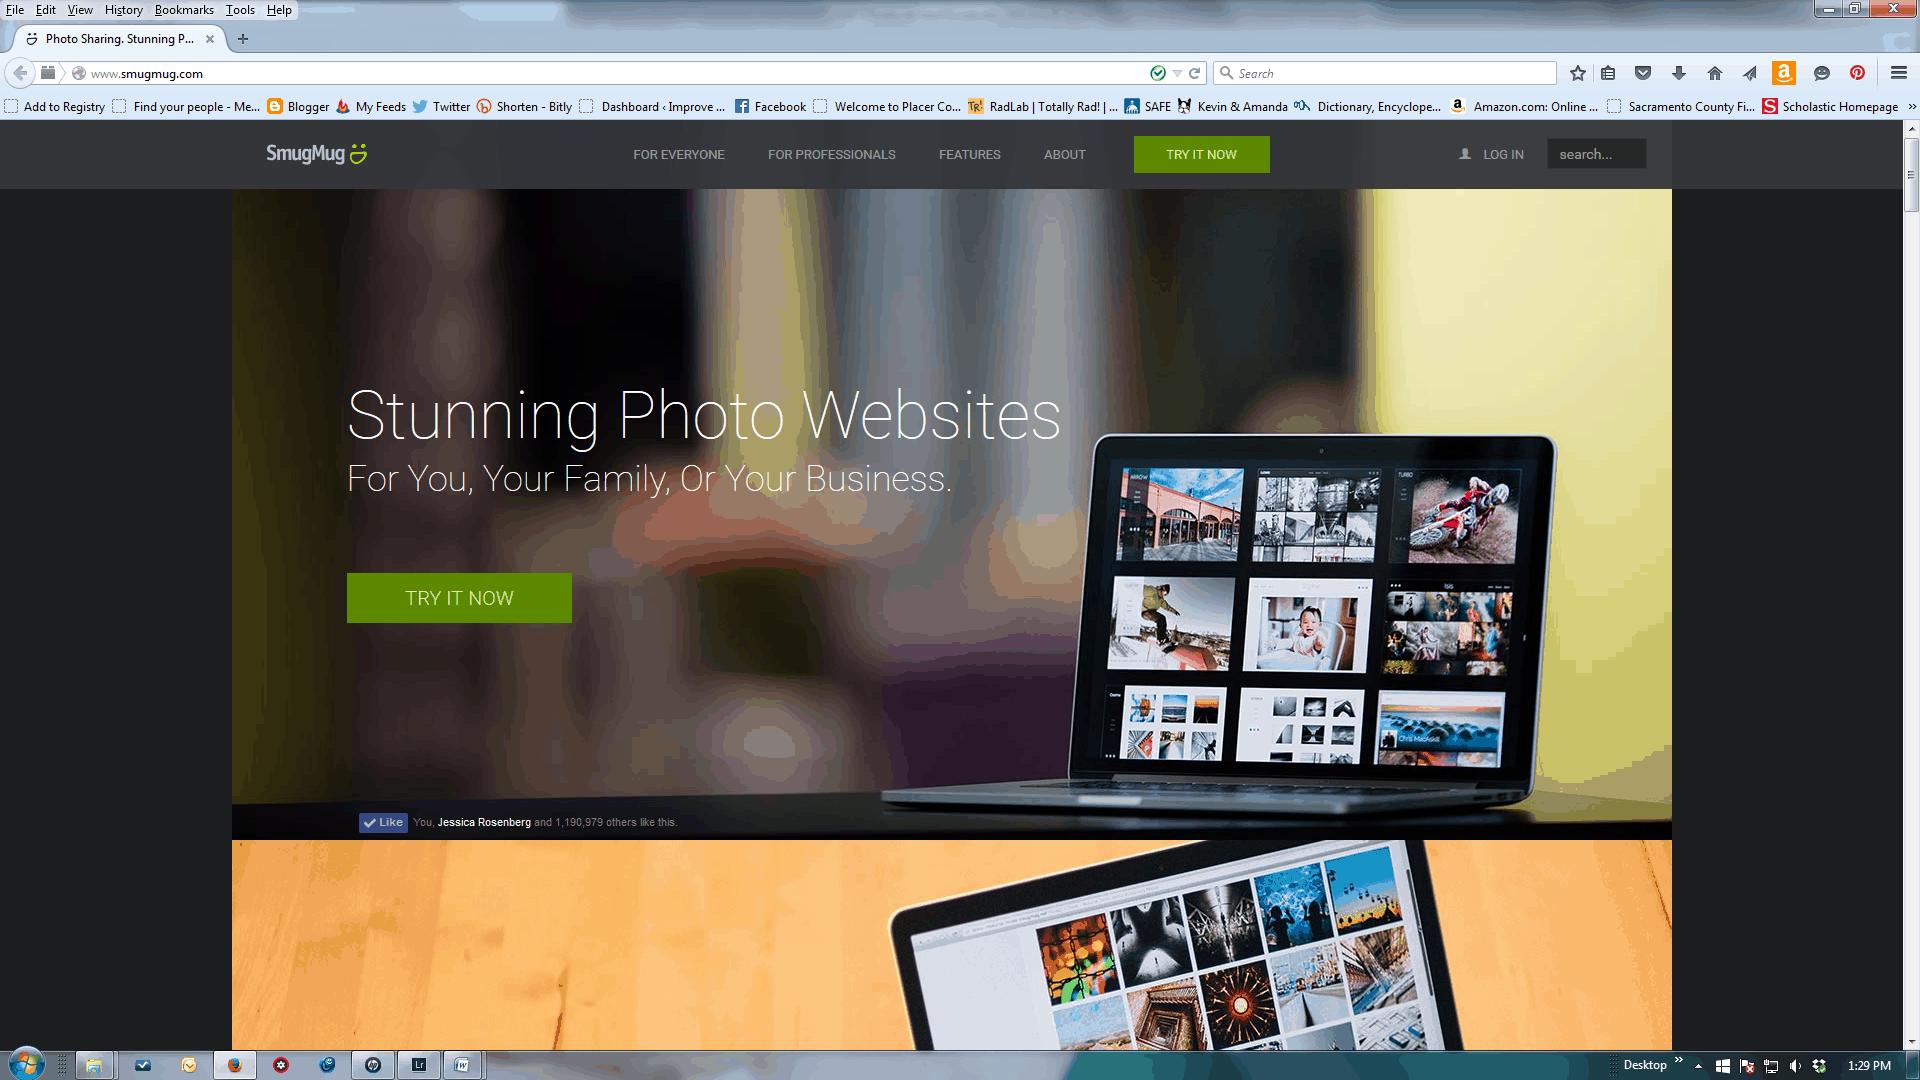 Does a Hobbyist Photographer Need a Website? – Improve